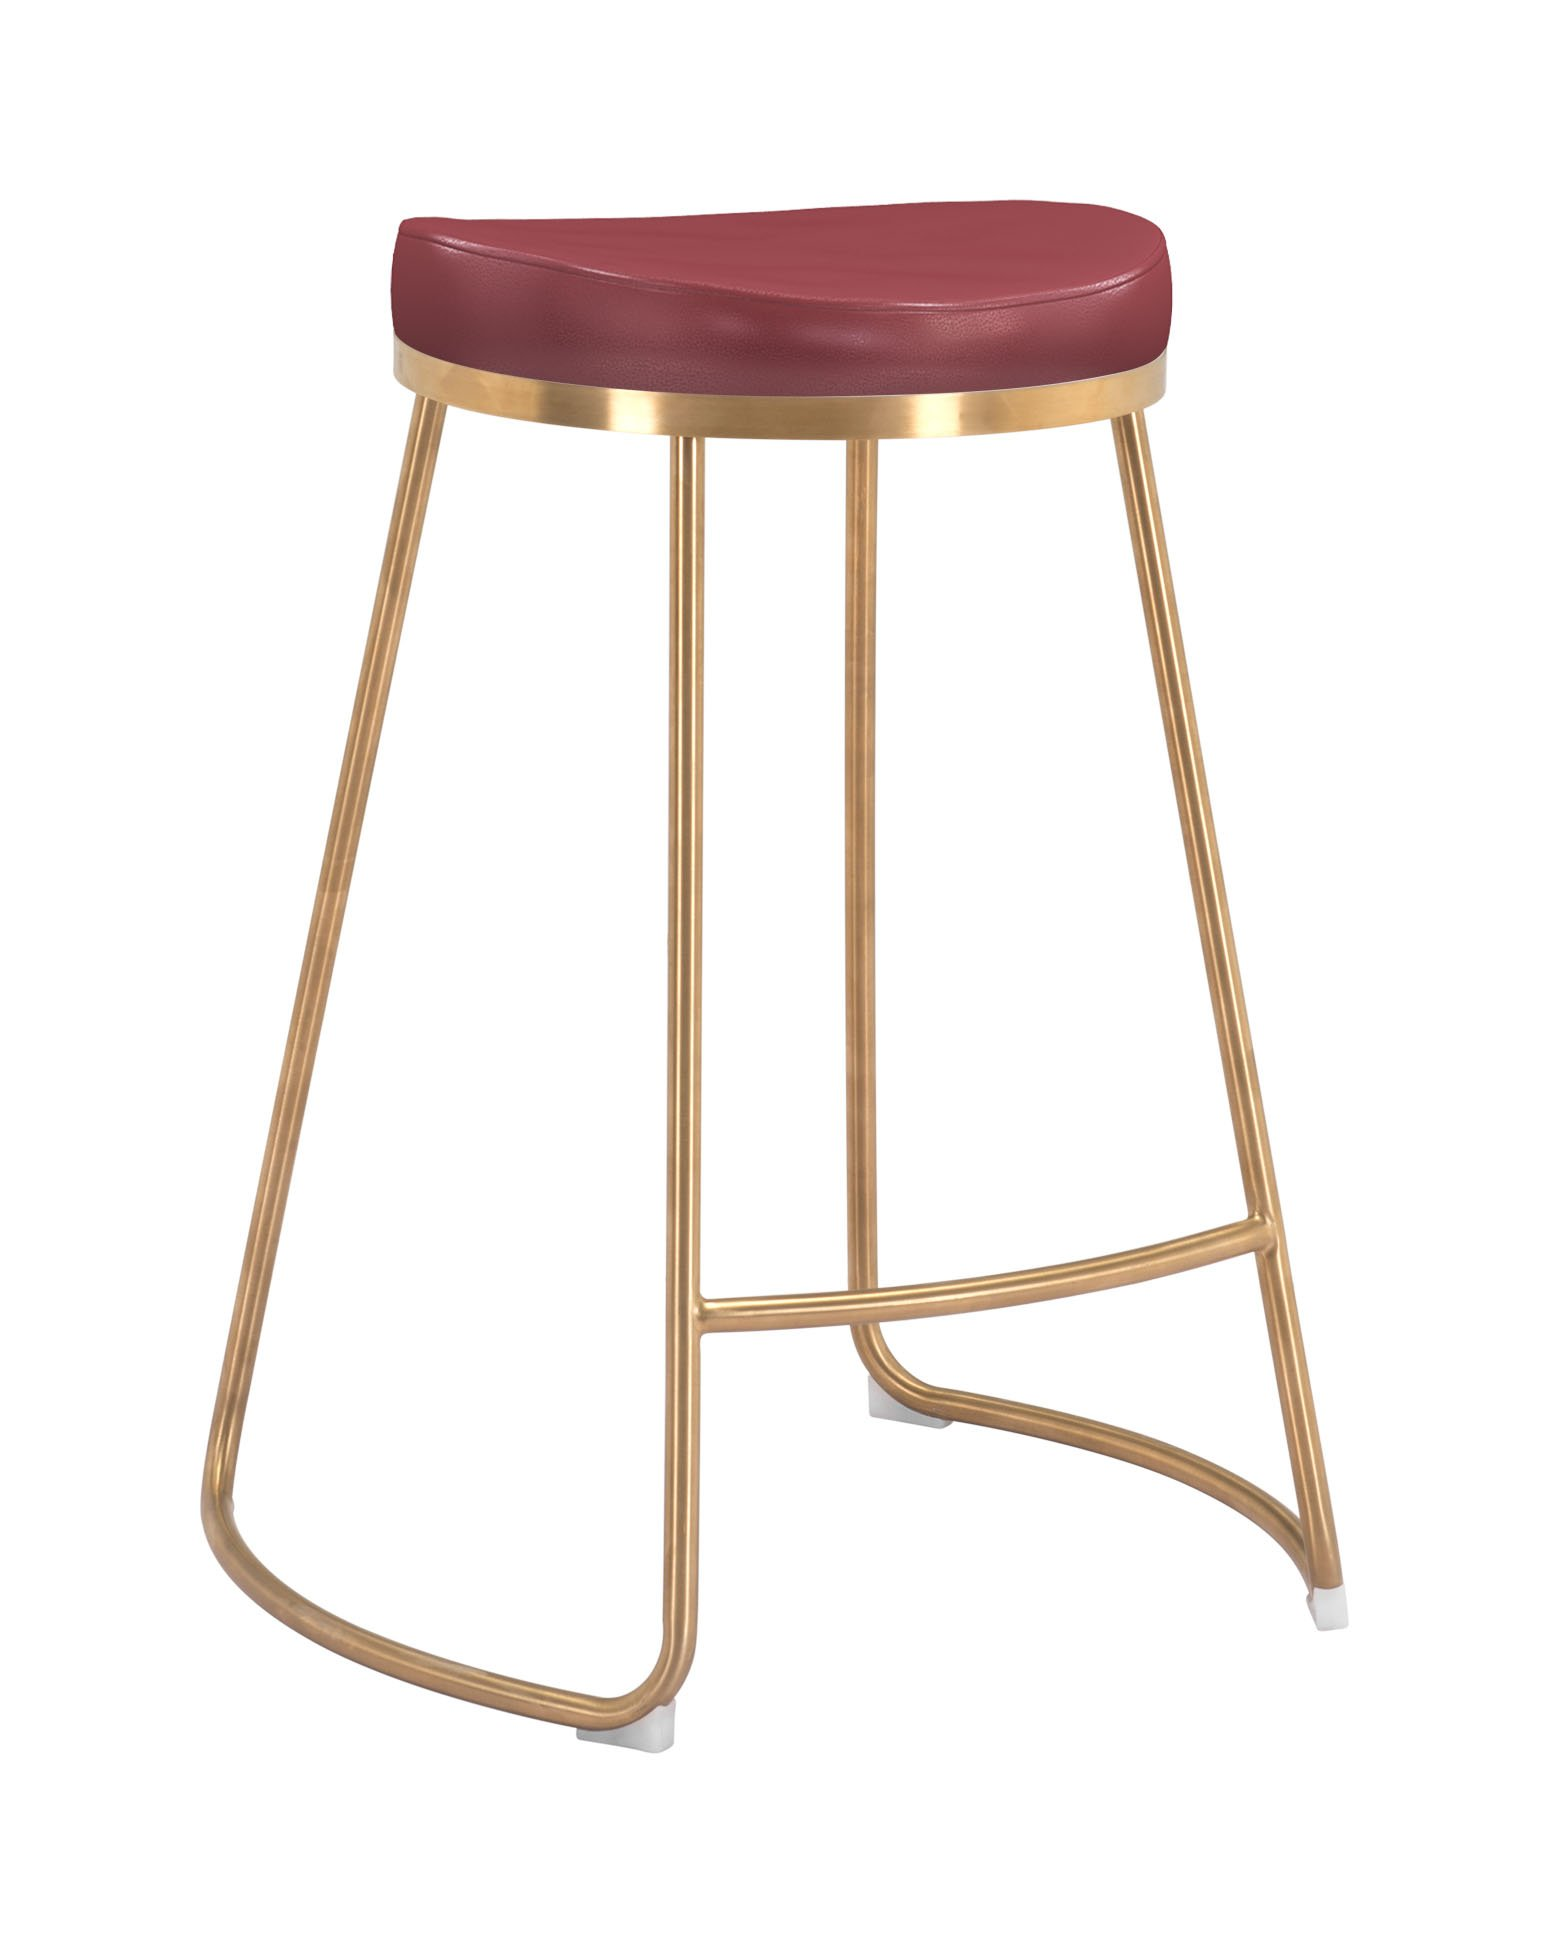 Groovy Bree Counter Stool Burgundy Set Of 2 By Zuo Modern Creativecarmelina Interior Chair Design Creativecarmelinacom